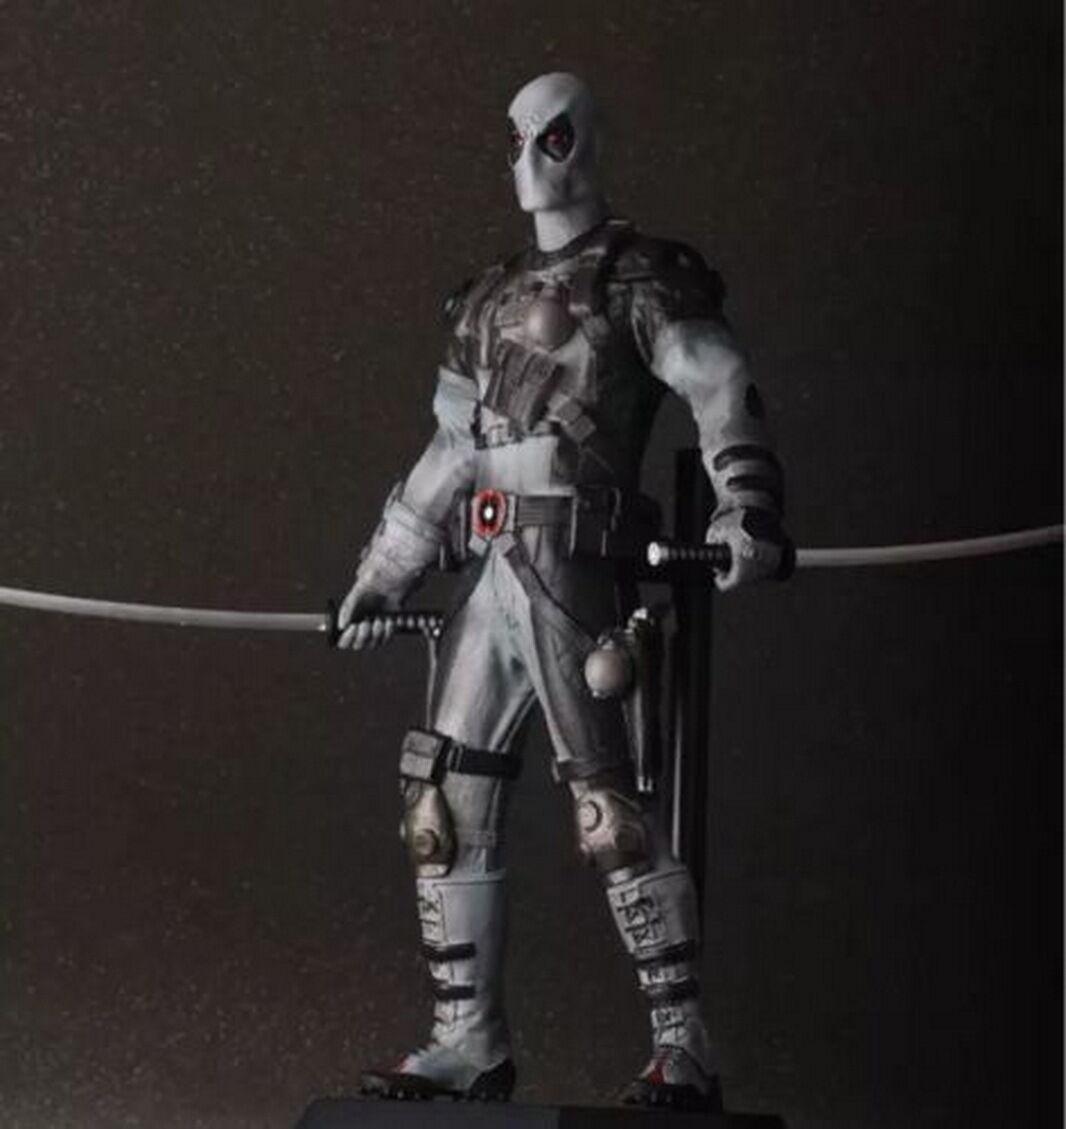 Crazy Toys Marvel X-men Deadpool Wade Wilson  Model Action Figure Toy Doll